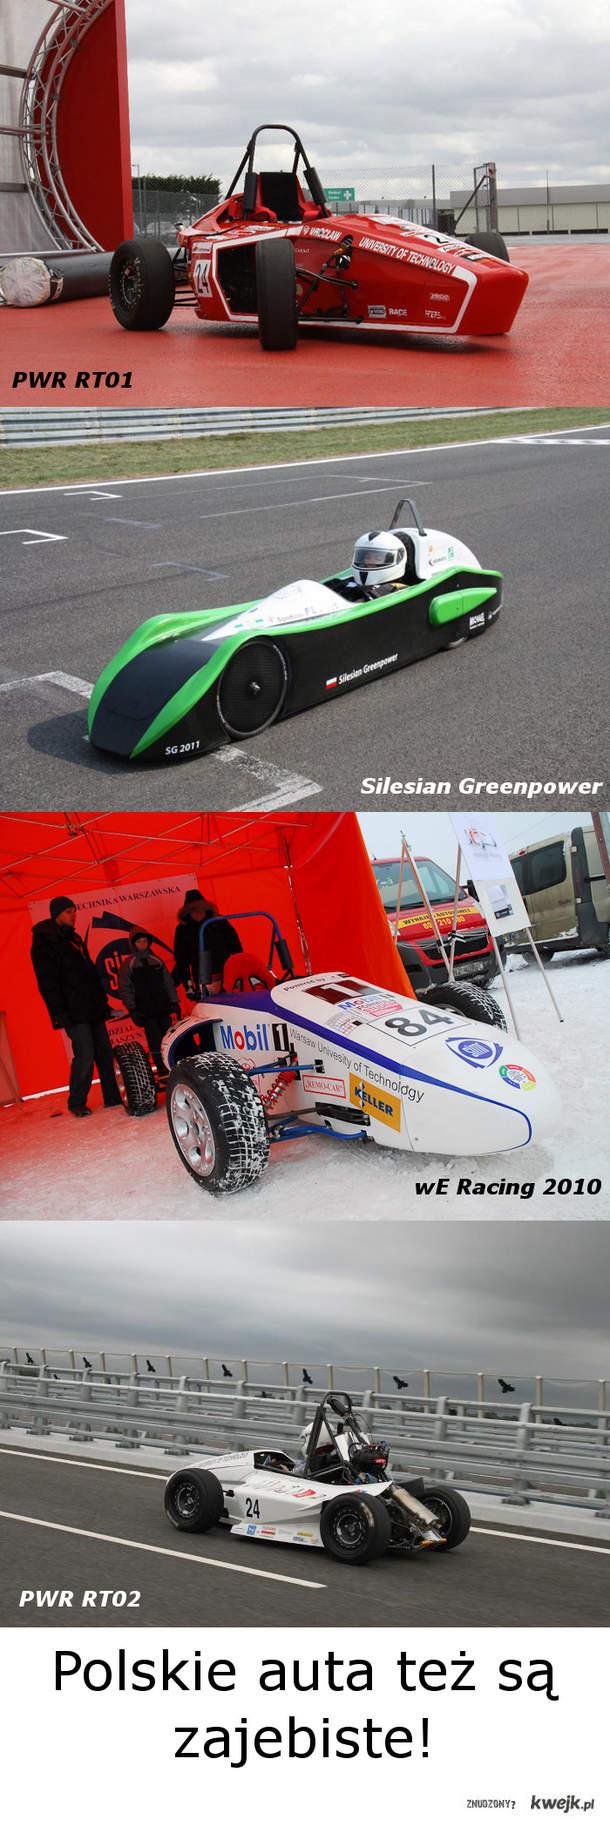 Formuła Student PWR RT01 RT02 SIMR Silesia Greenpower Polska Motoryzacja